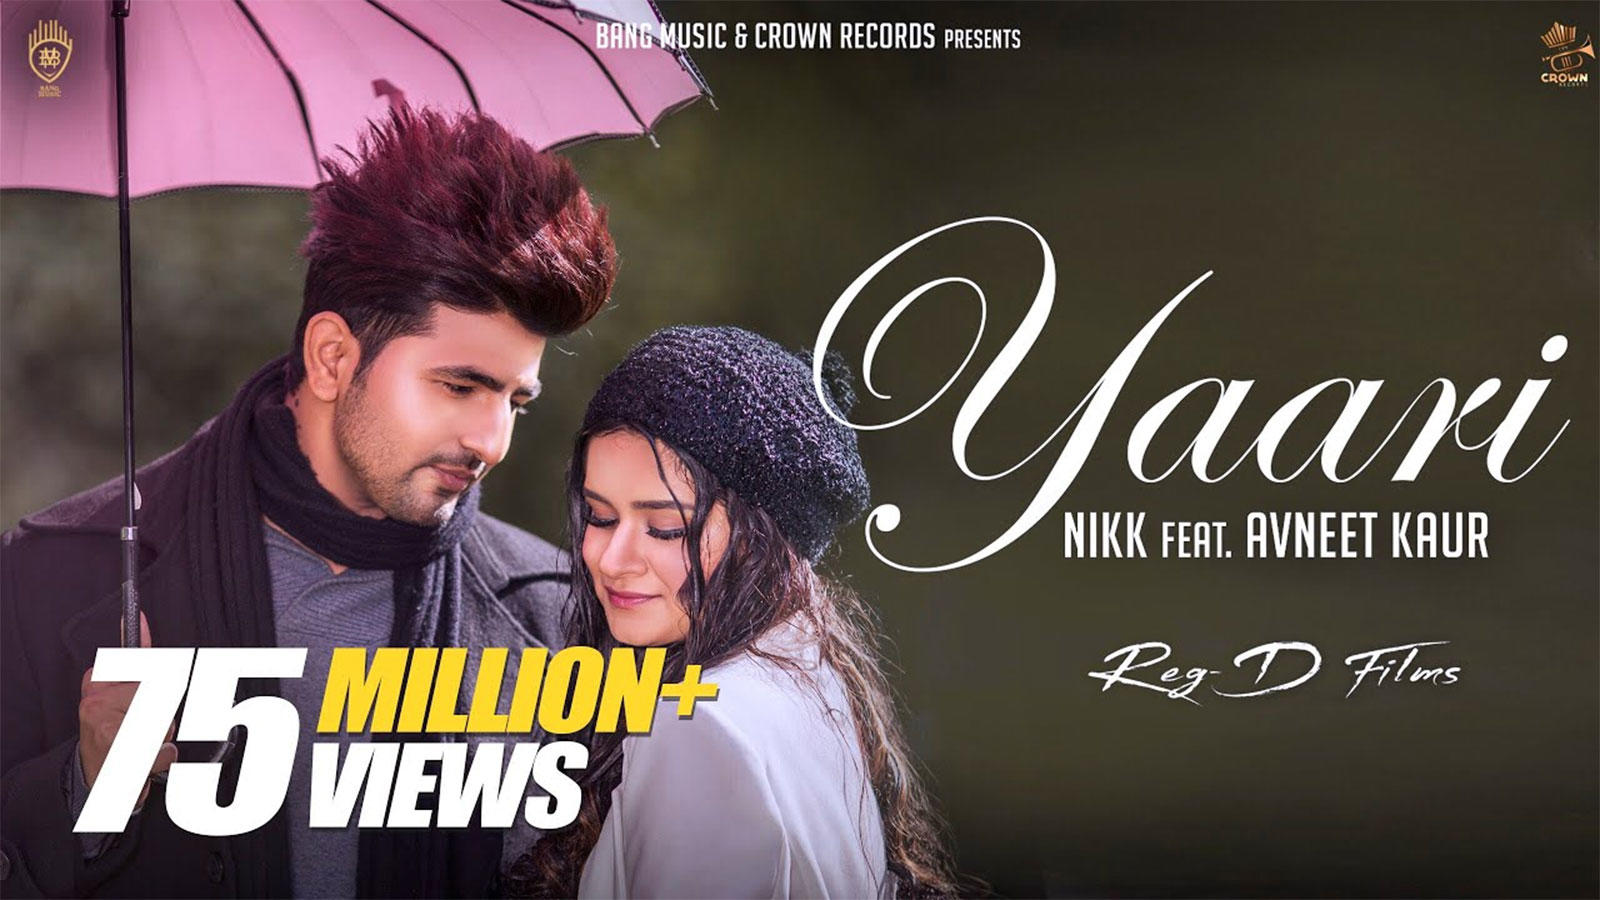 Punjabi Song 'Yaari' Sung By Nikk Featuring Avneet Kaur | Punjabi Video  Songs - Times of India